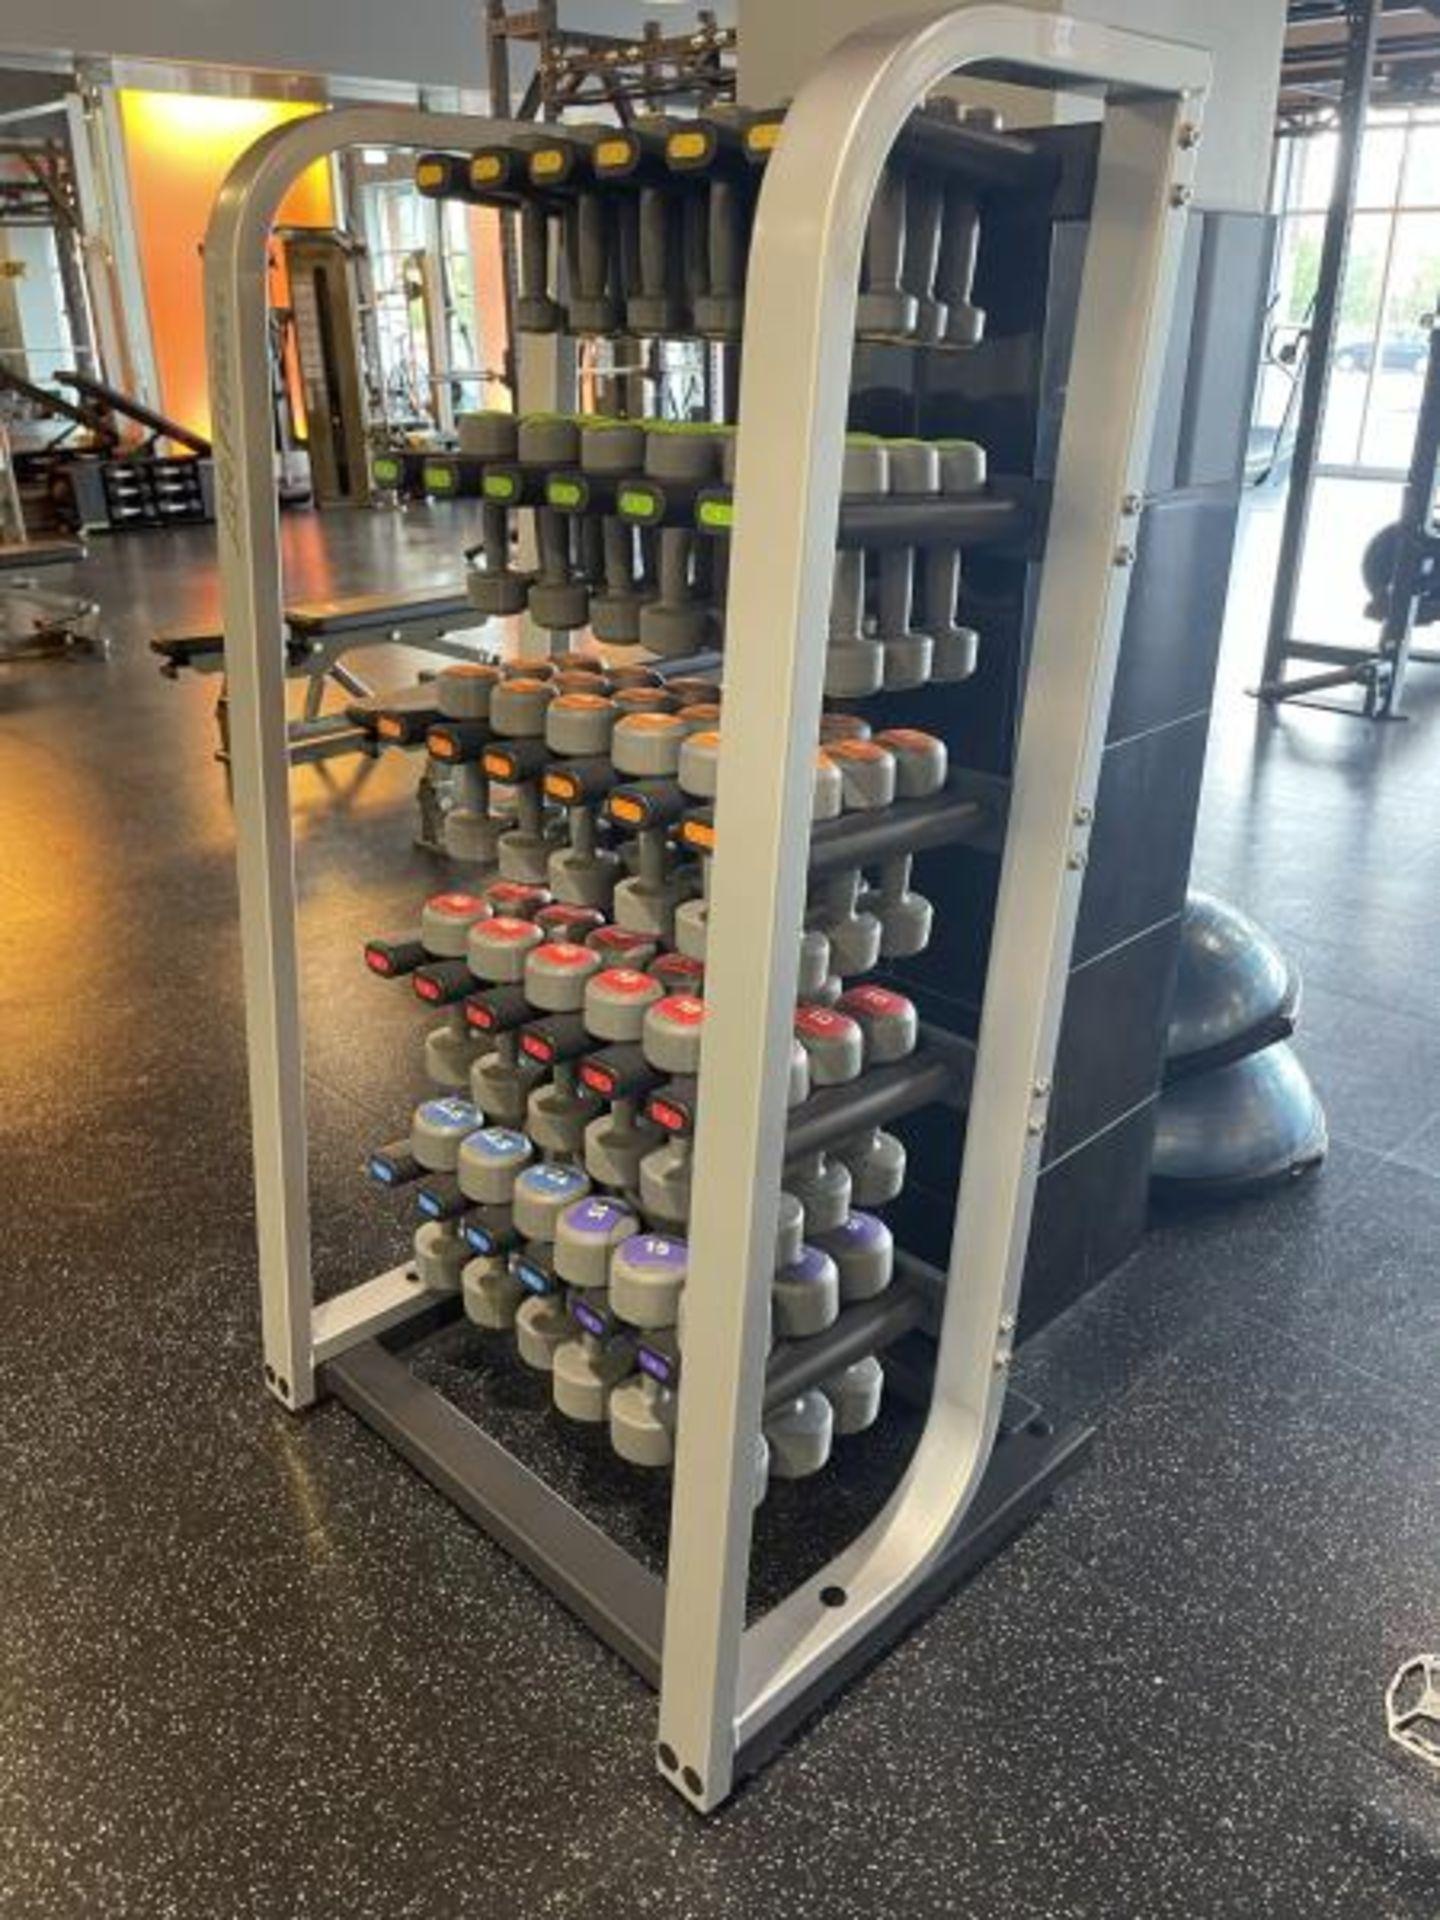 Life Fitness Dumbbell Rack, Coated, Lift Fitness Dumbbells 2.5, 5, 7.5, 10, 12.5, 15 LBS - Image 4 of 4